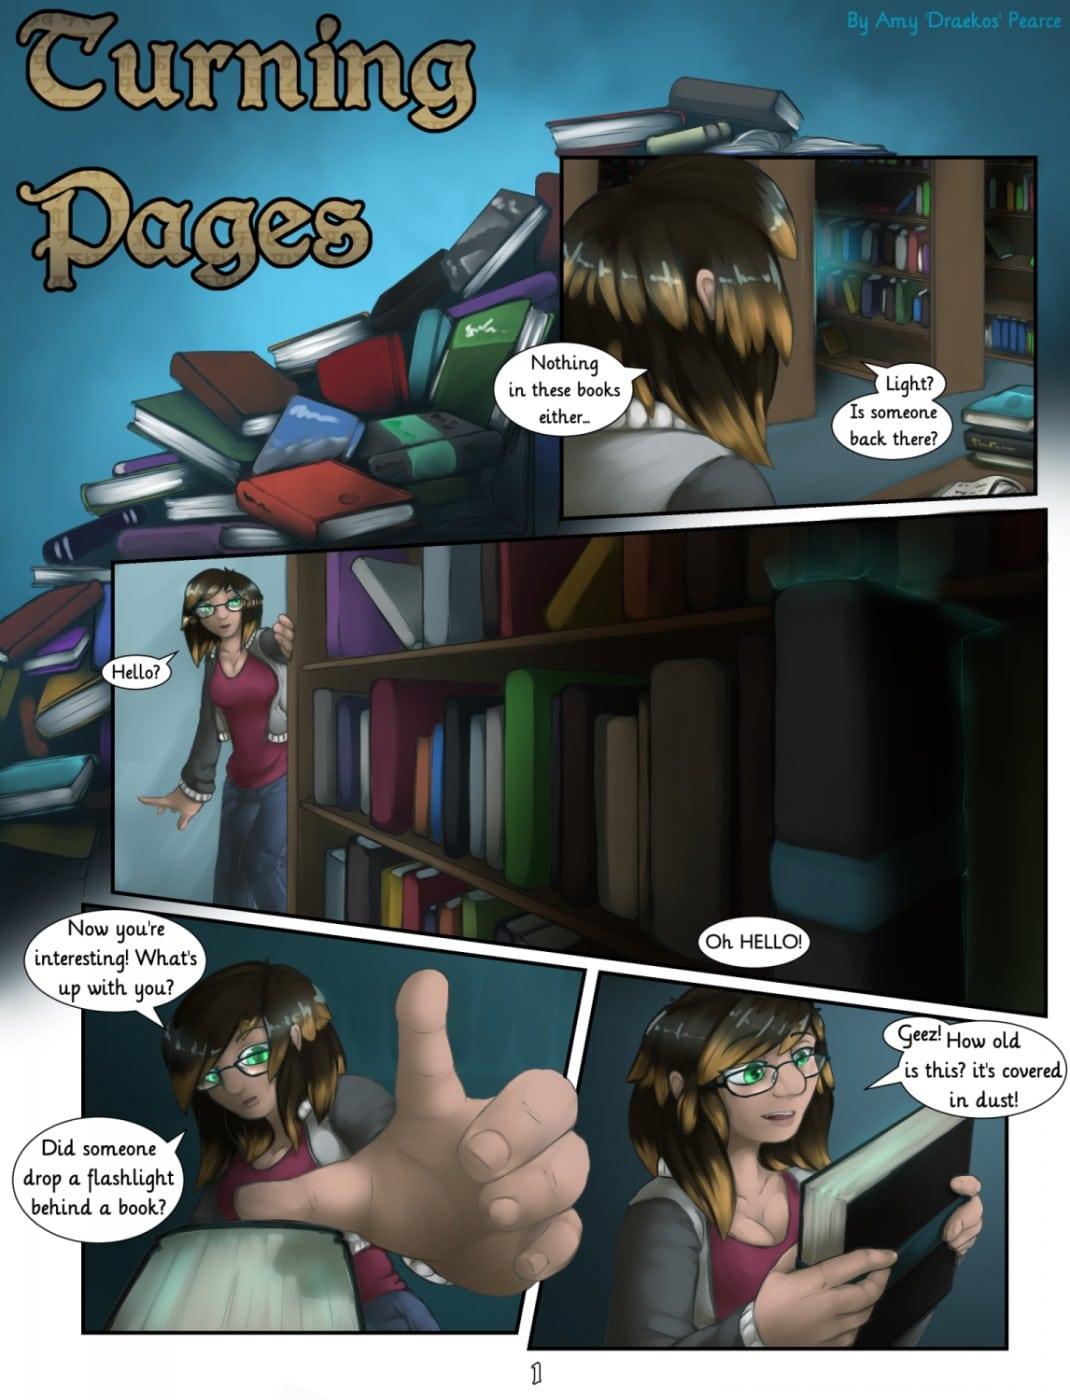 Turning Pages- Draekos image 1